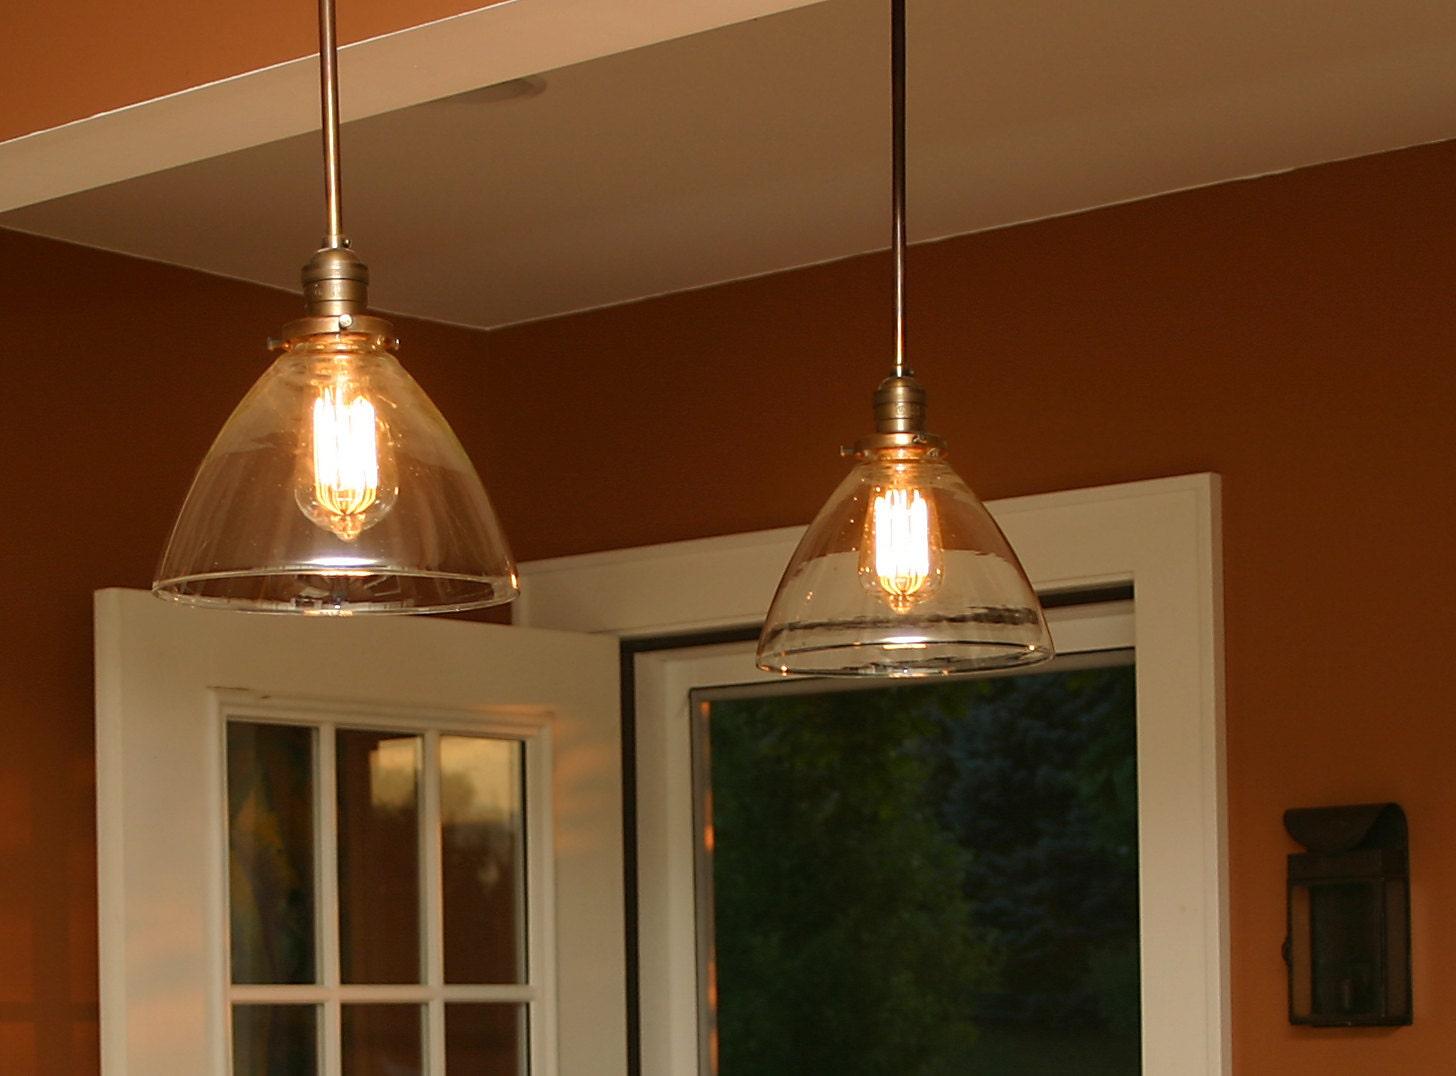 Custom Pendant Light With Blown Glass Shade